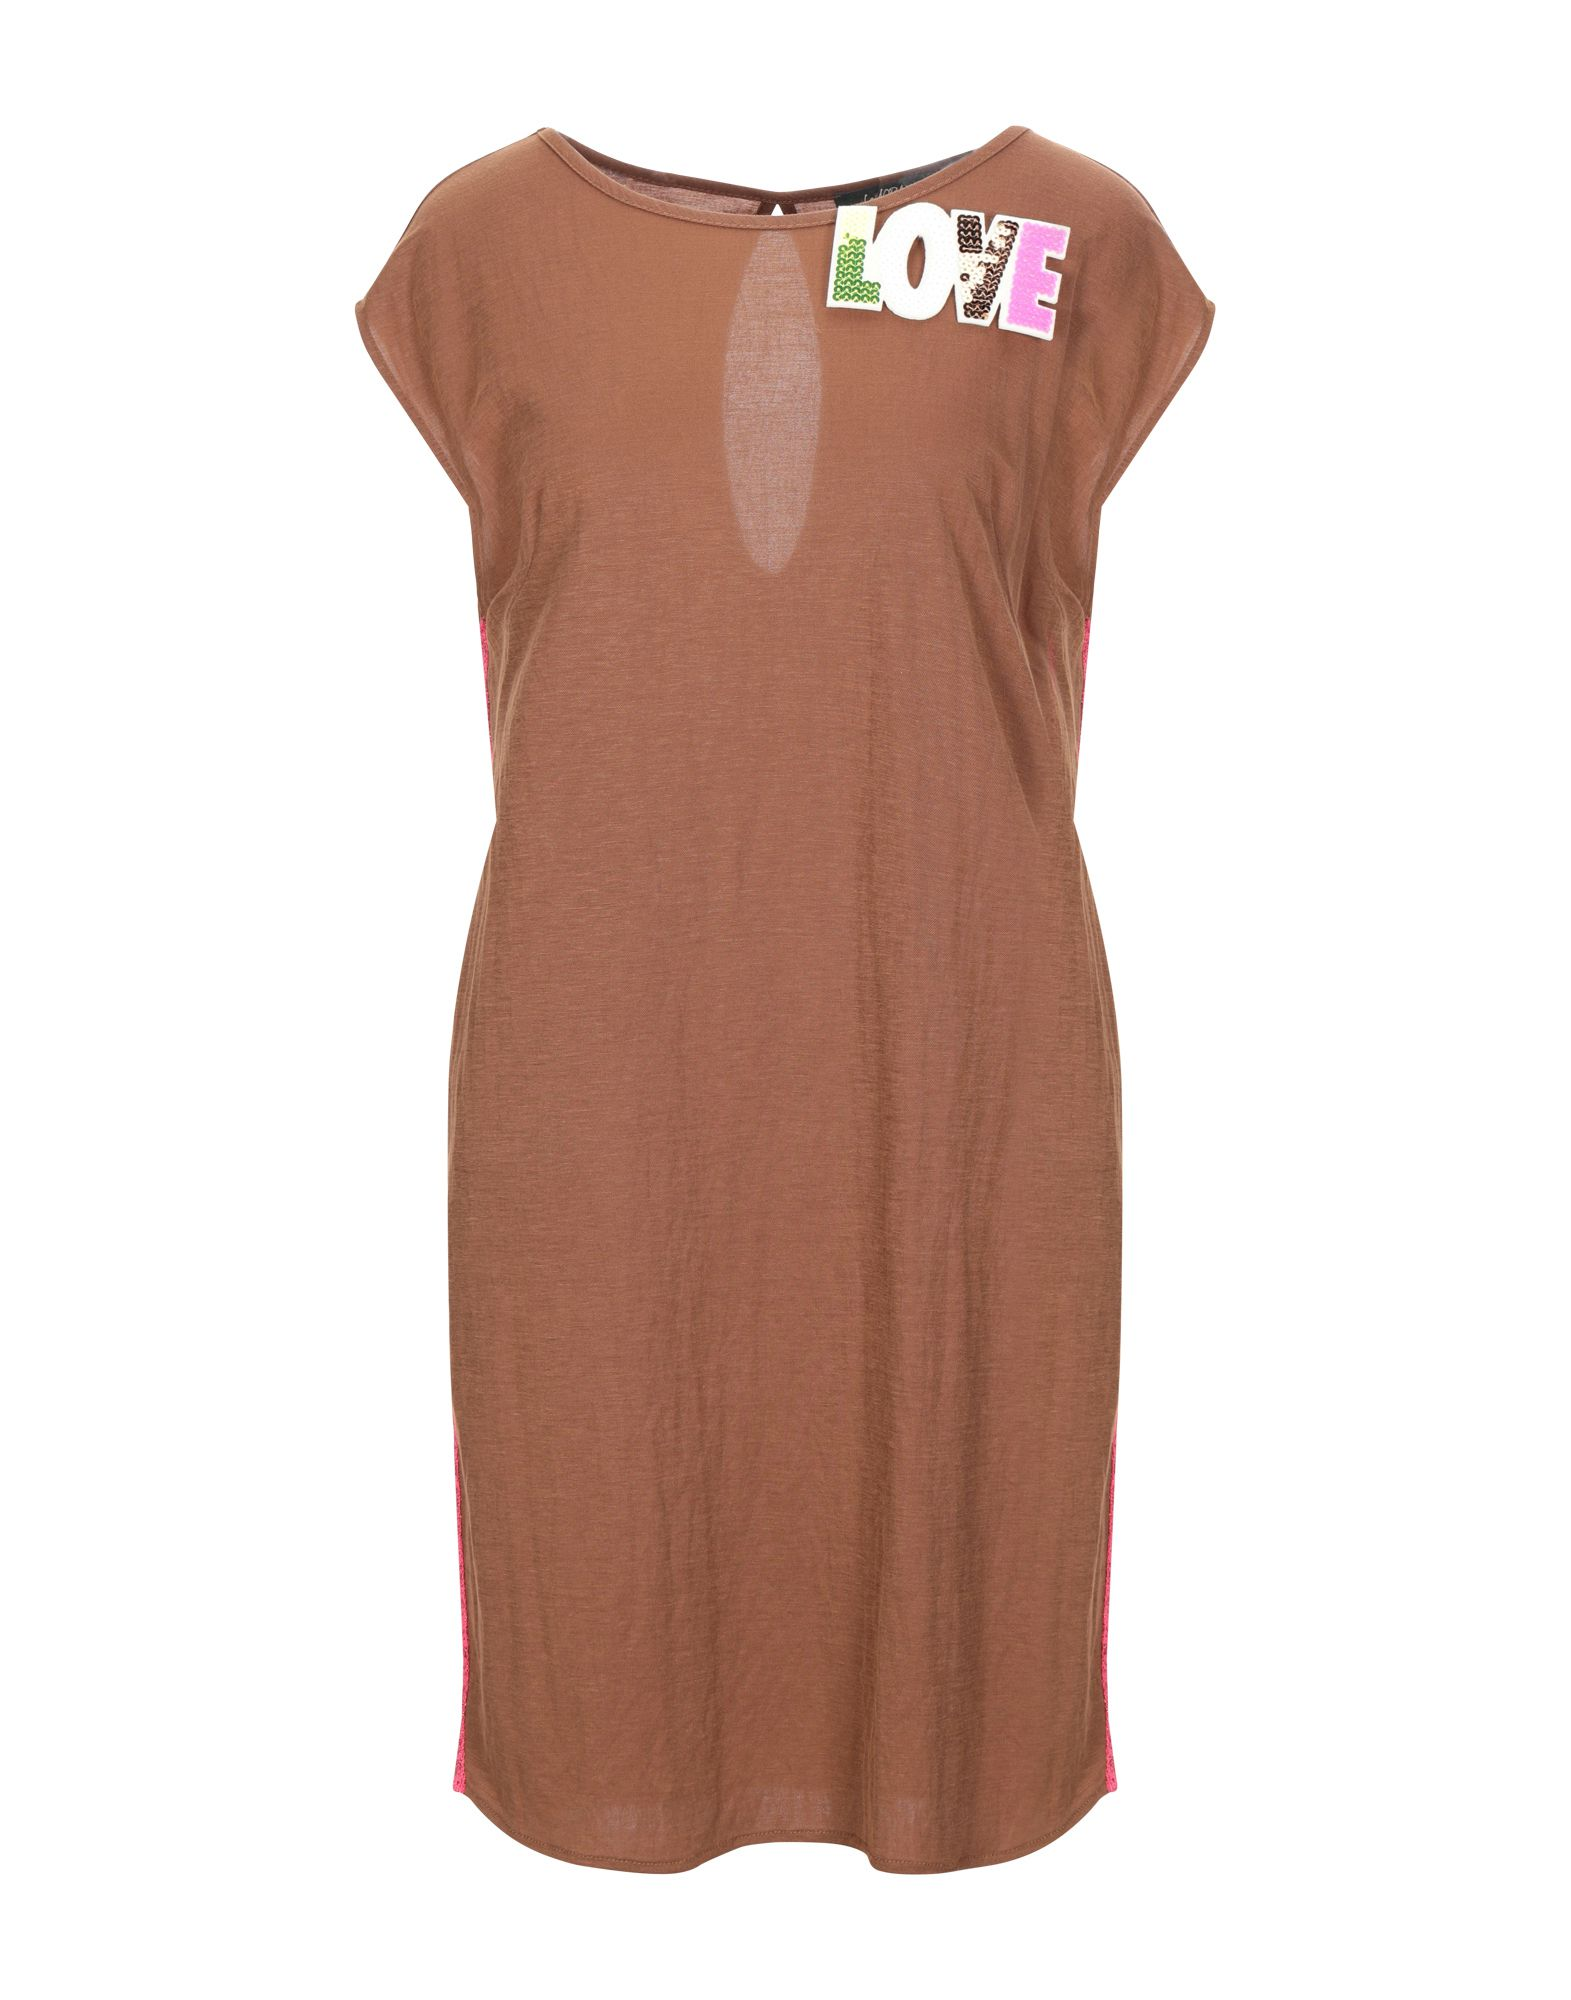 LA MORA GLAMOUR Короткое платье детское платье glamour 0507 2015 x 0507b